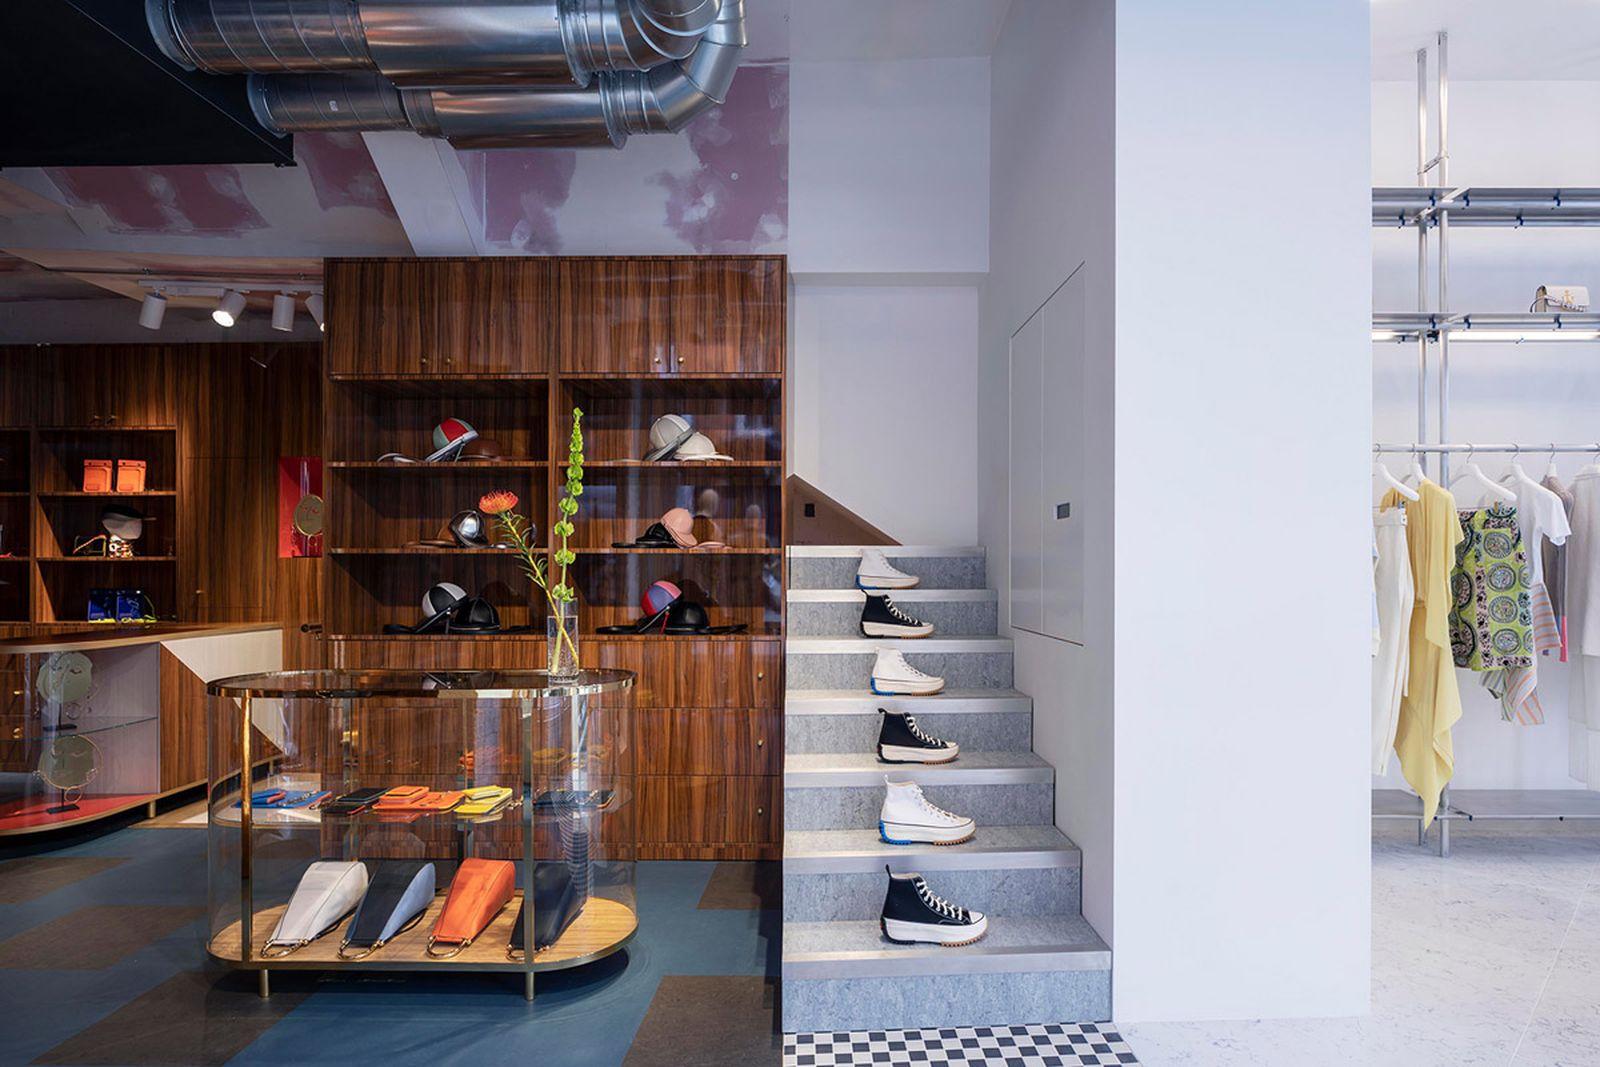 jw-jonathan-anderson-soho-london-uk-flagship-store-opening-7